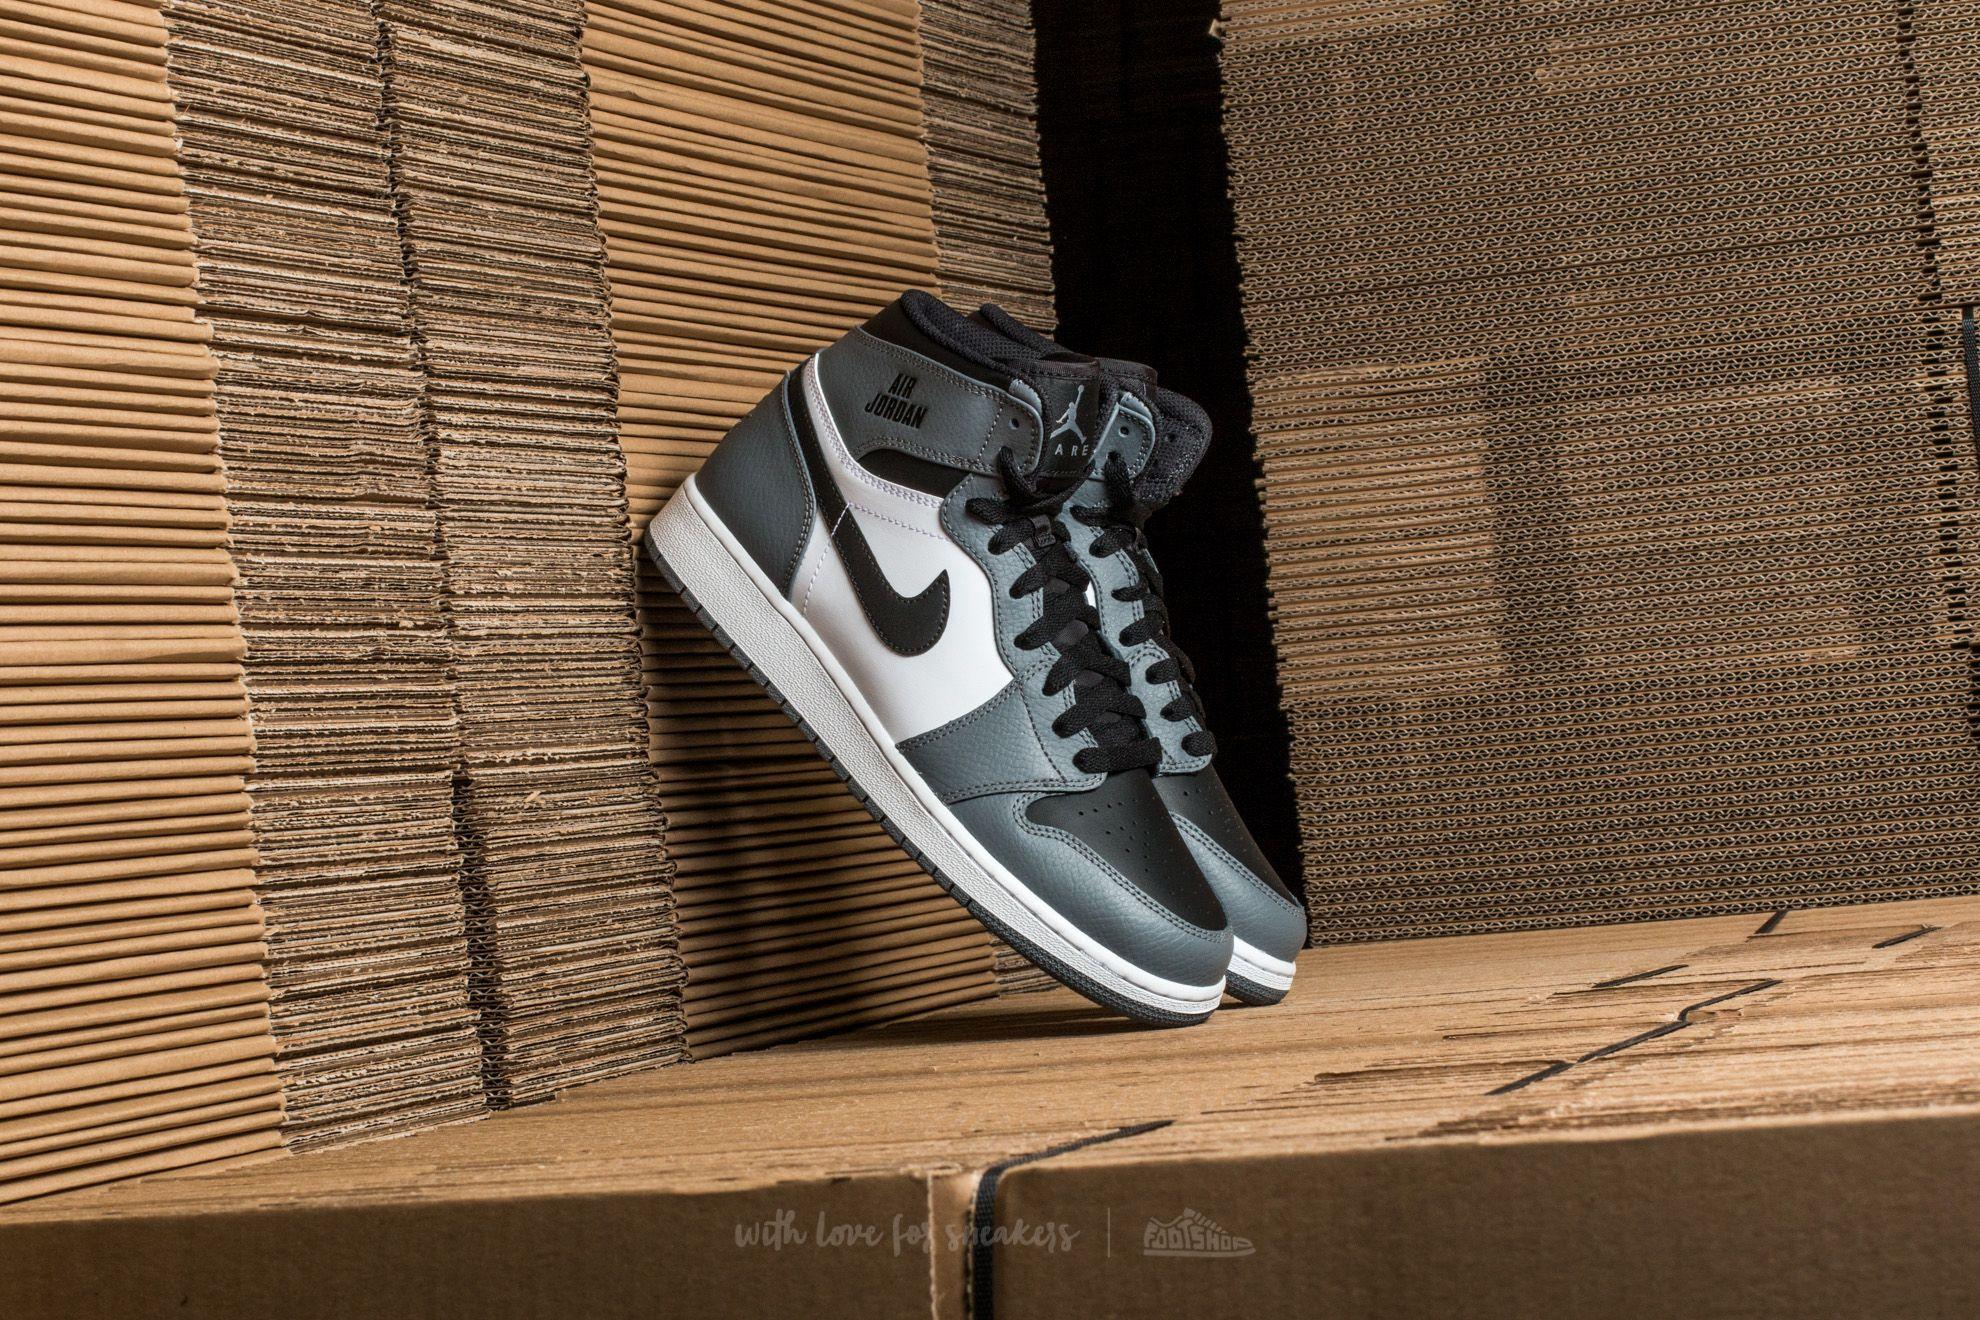 443ff2d20d53 Air Jordan 1 Retro High (BG) Cool Grey  Cool Grey-White